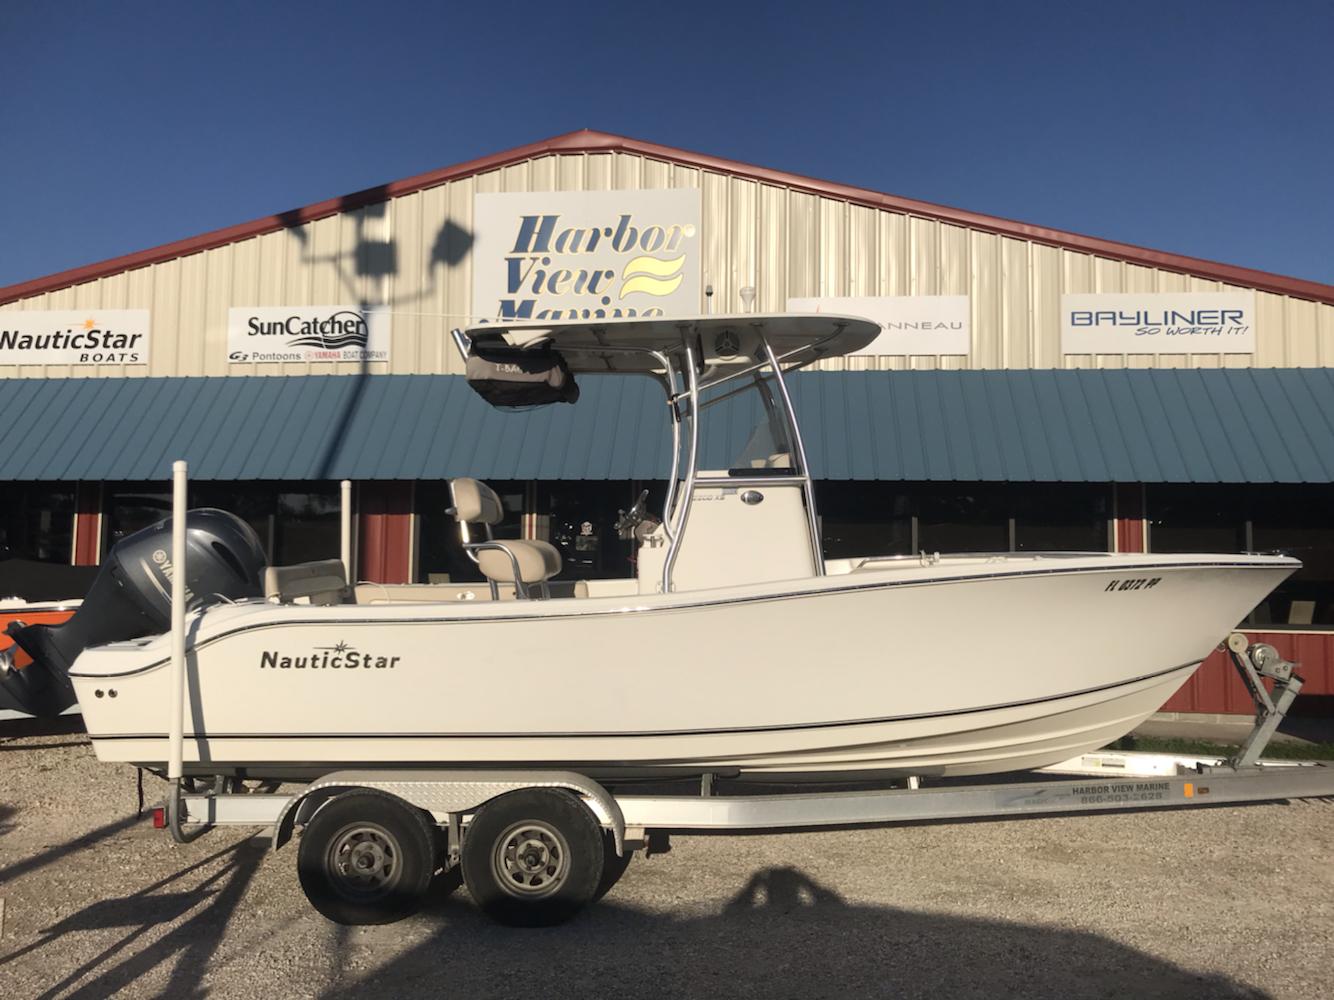 NauticStar XS Series Boat 2200 XS